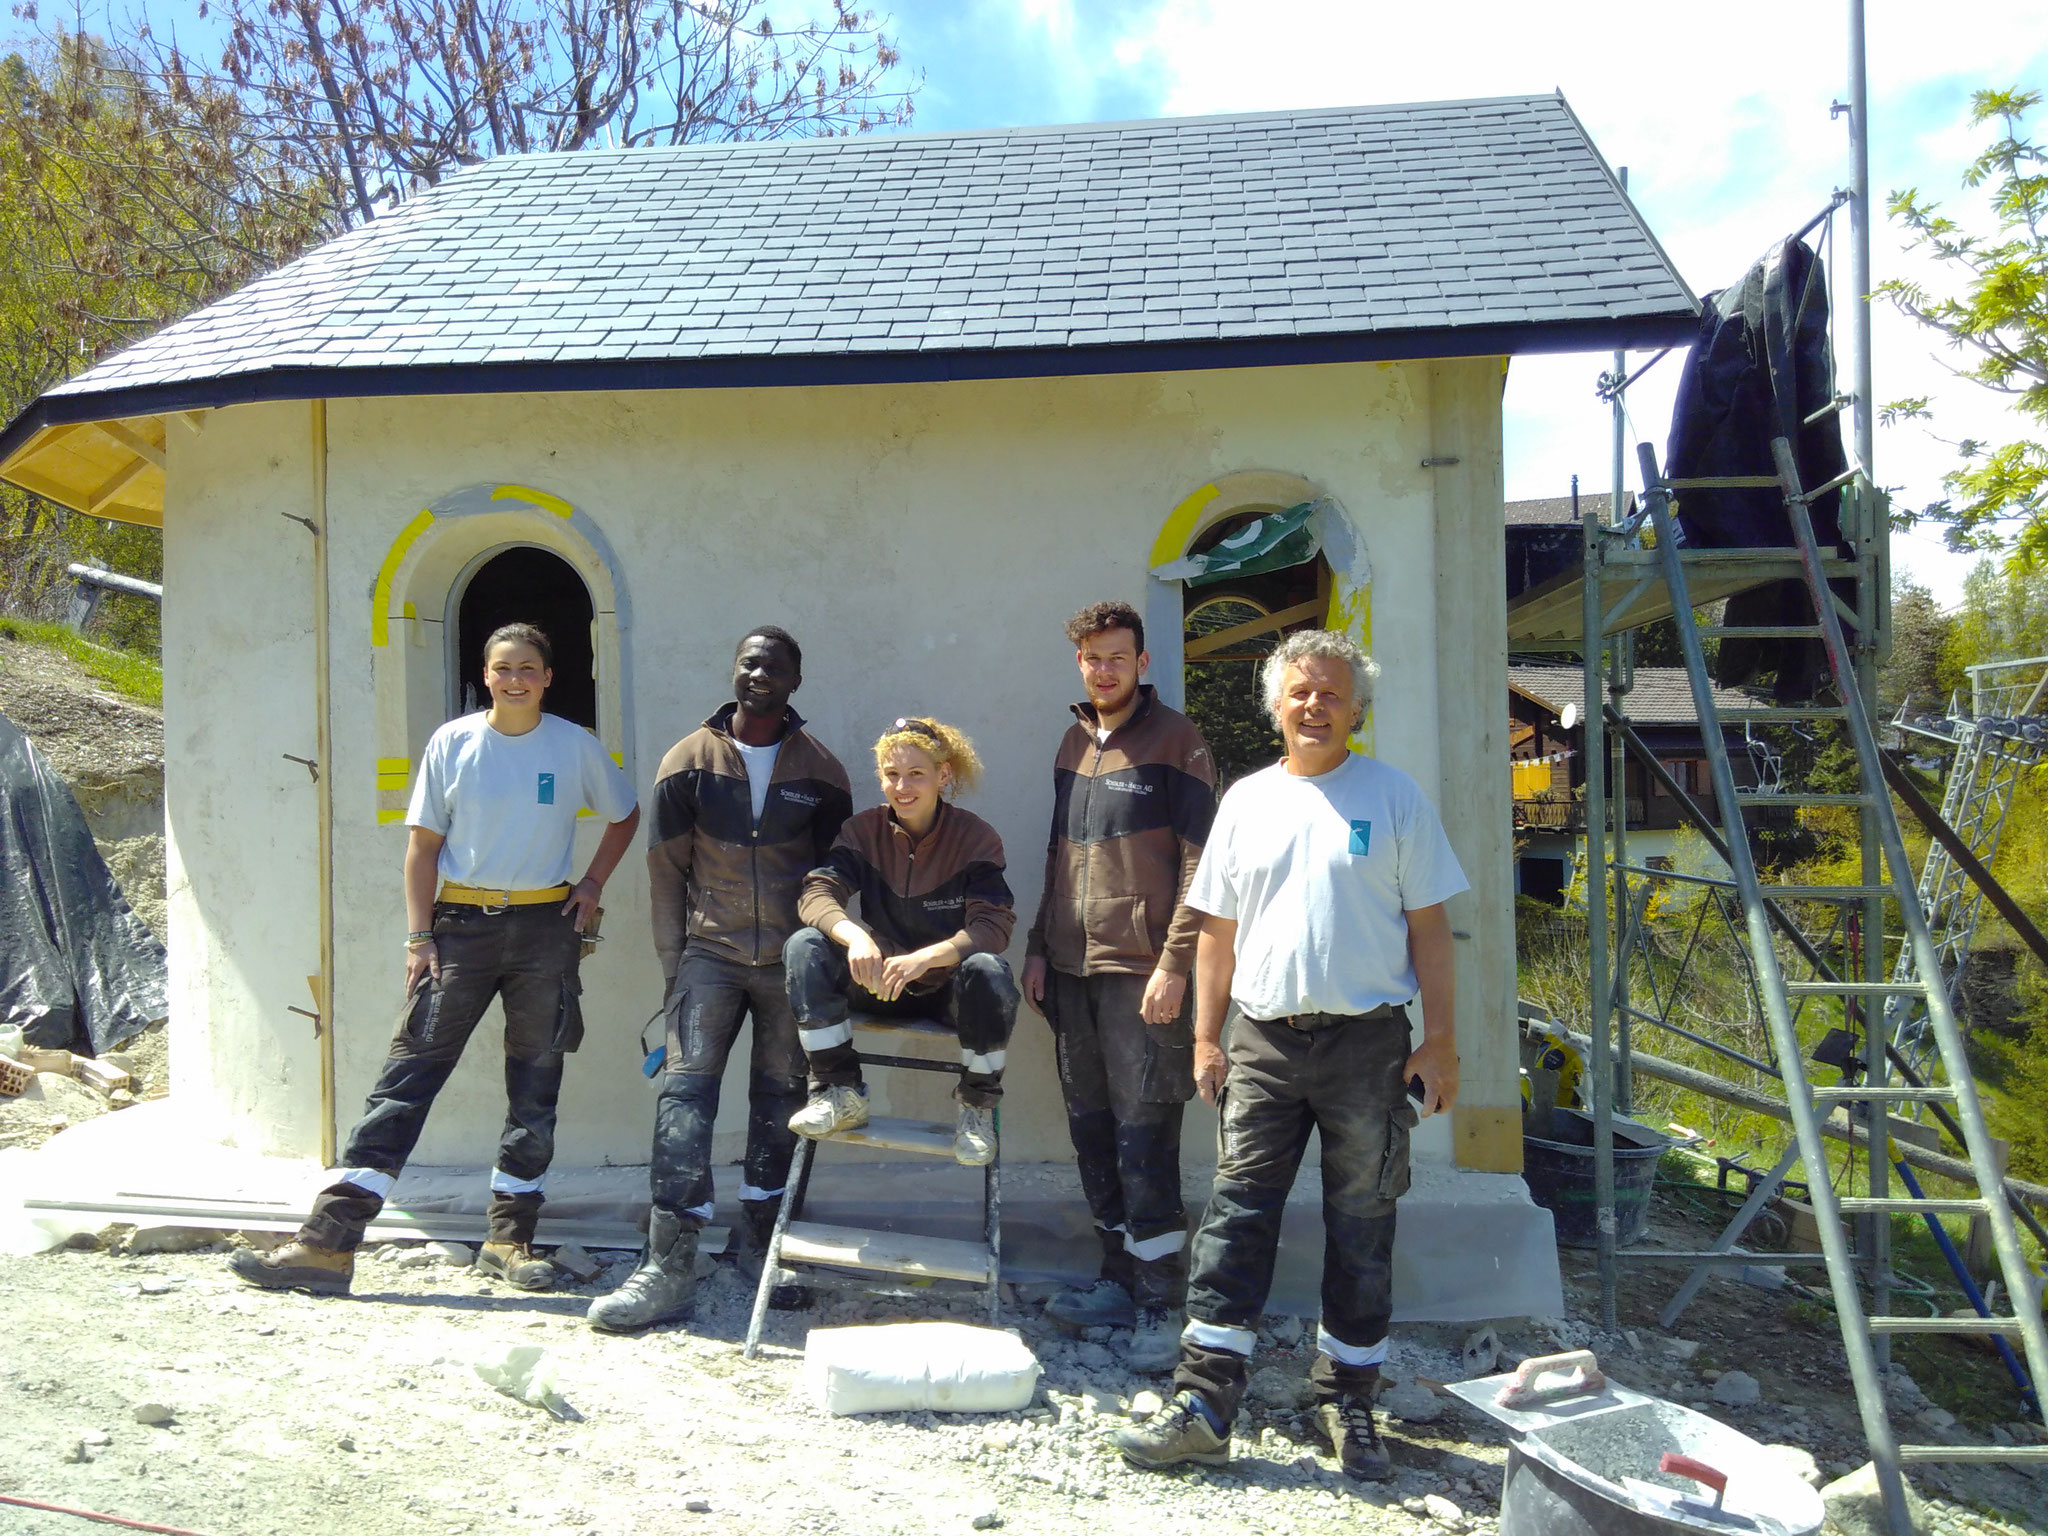 Bauteam Schibler + Haldi AG